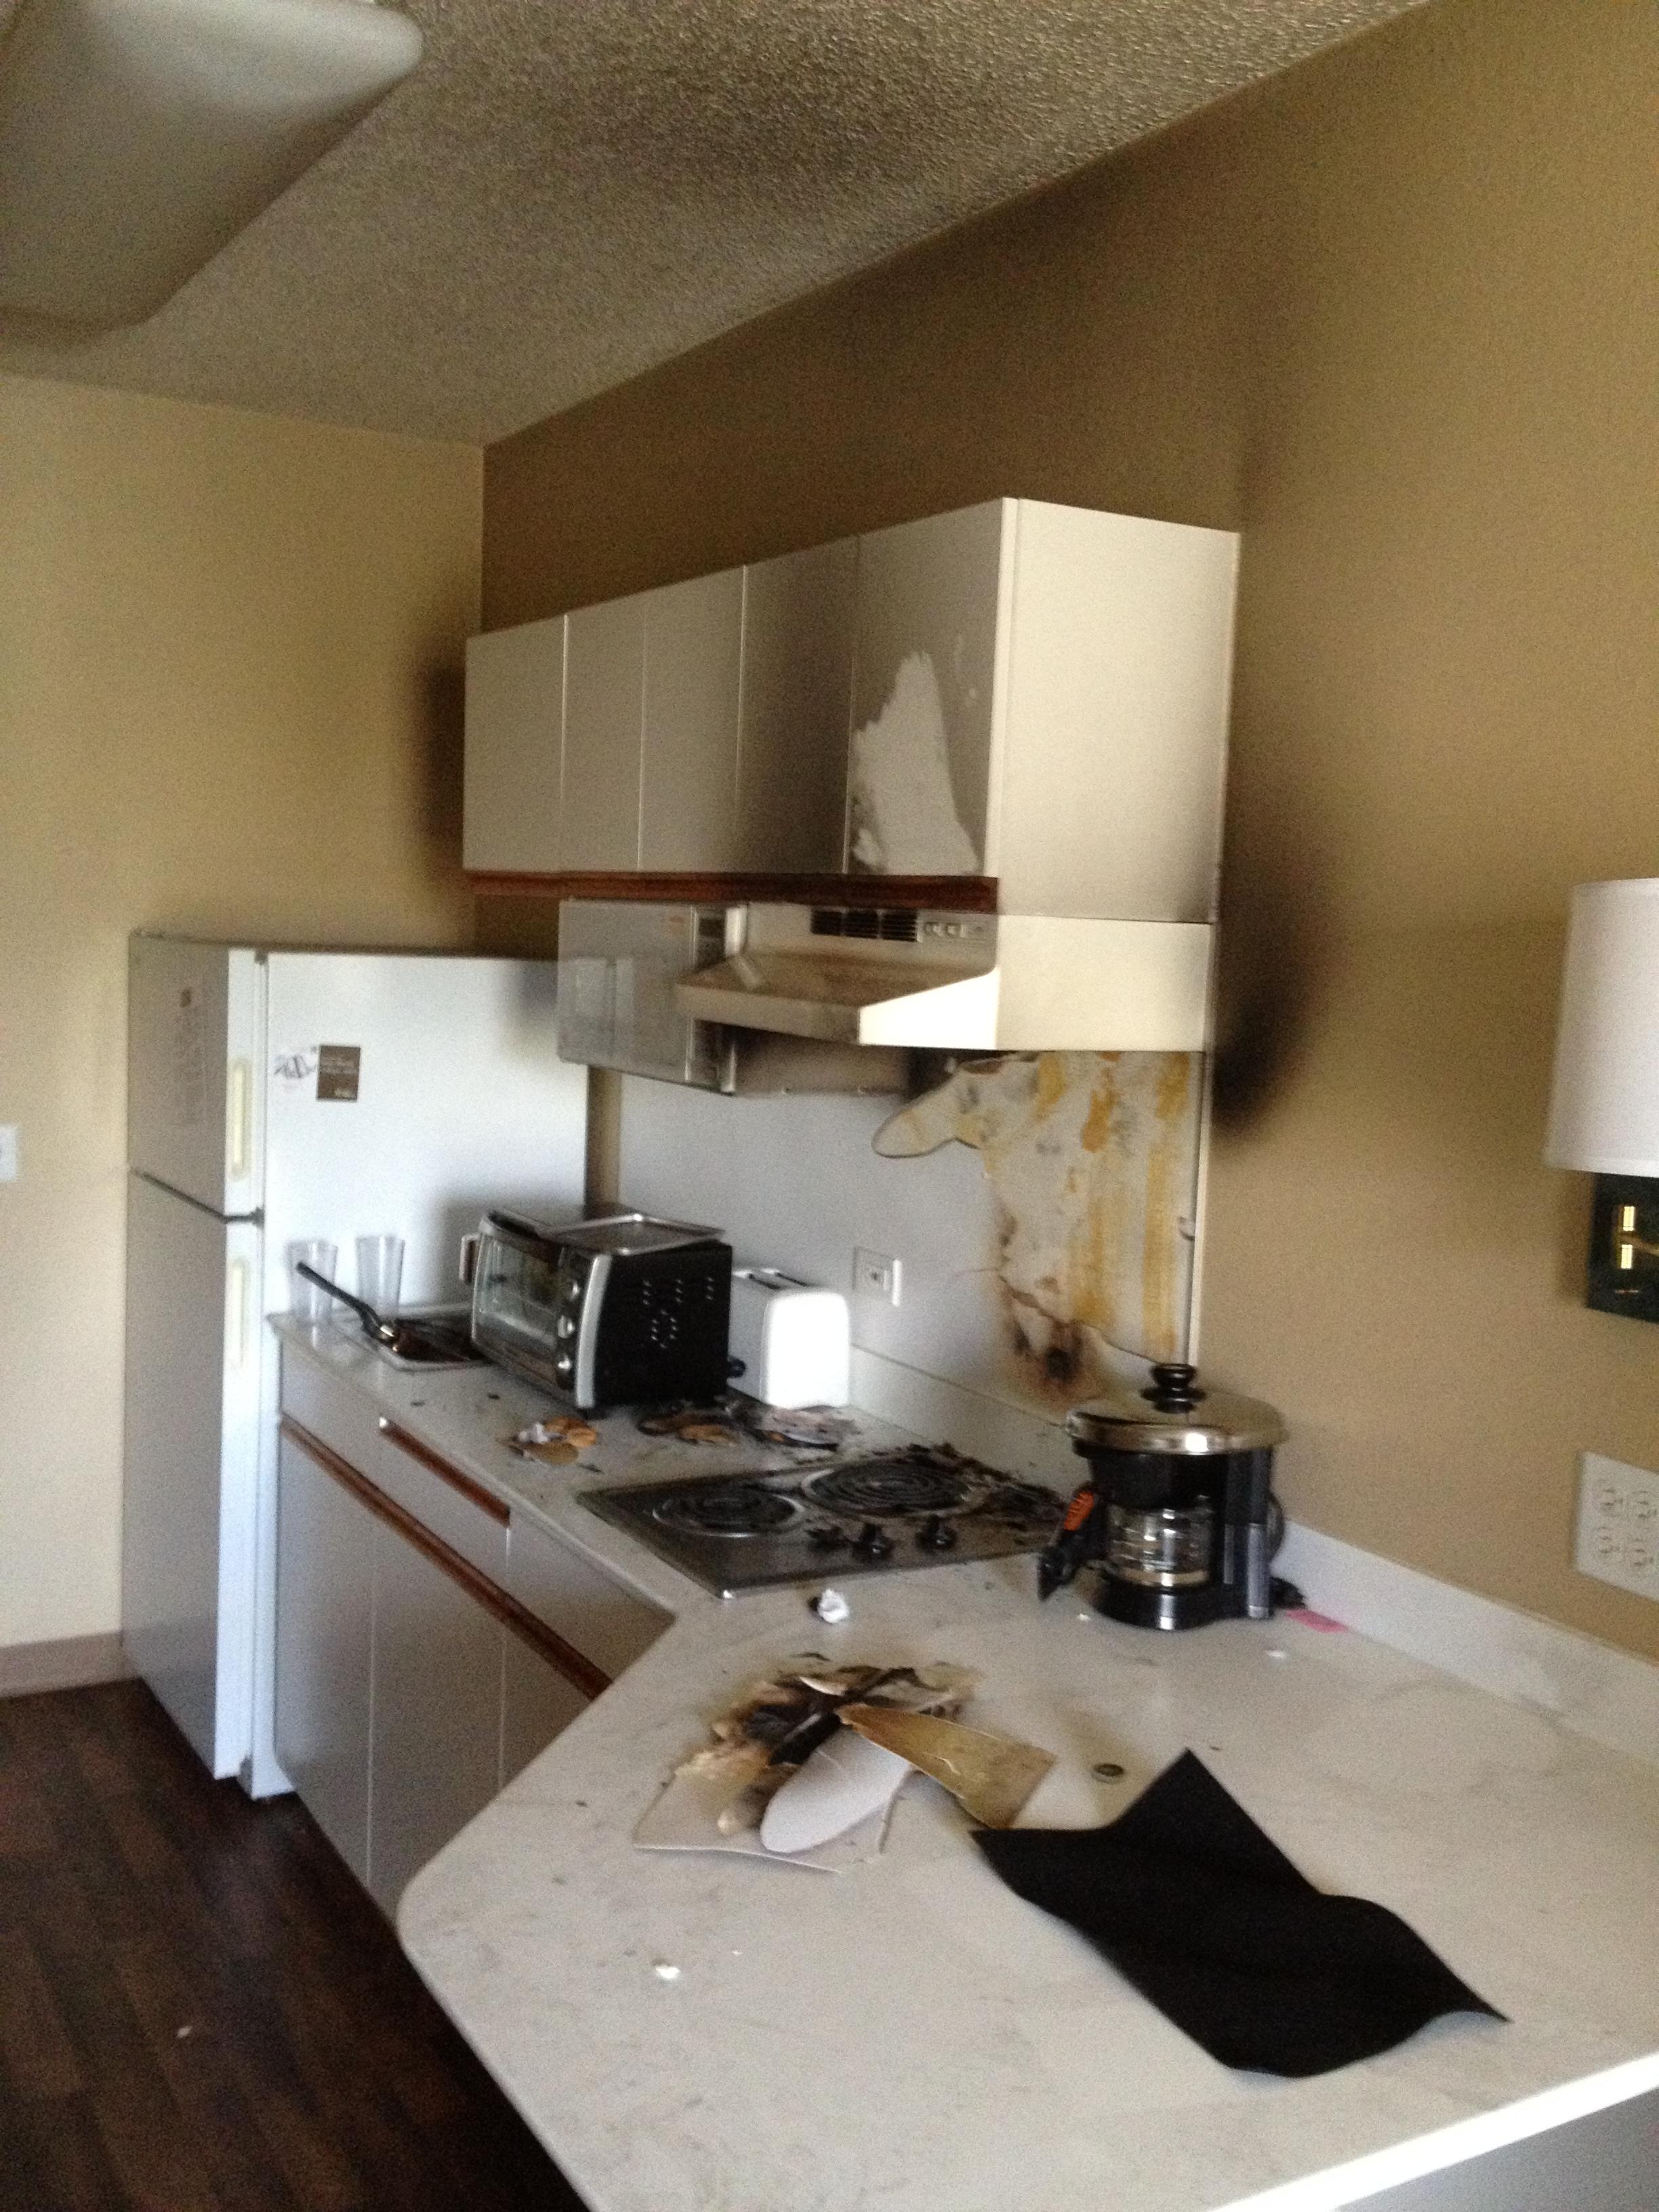 Fire Damage 1-1